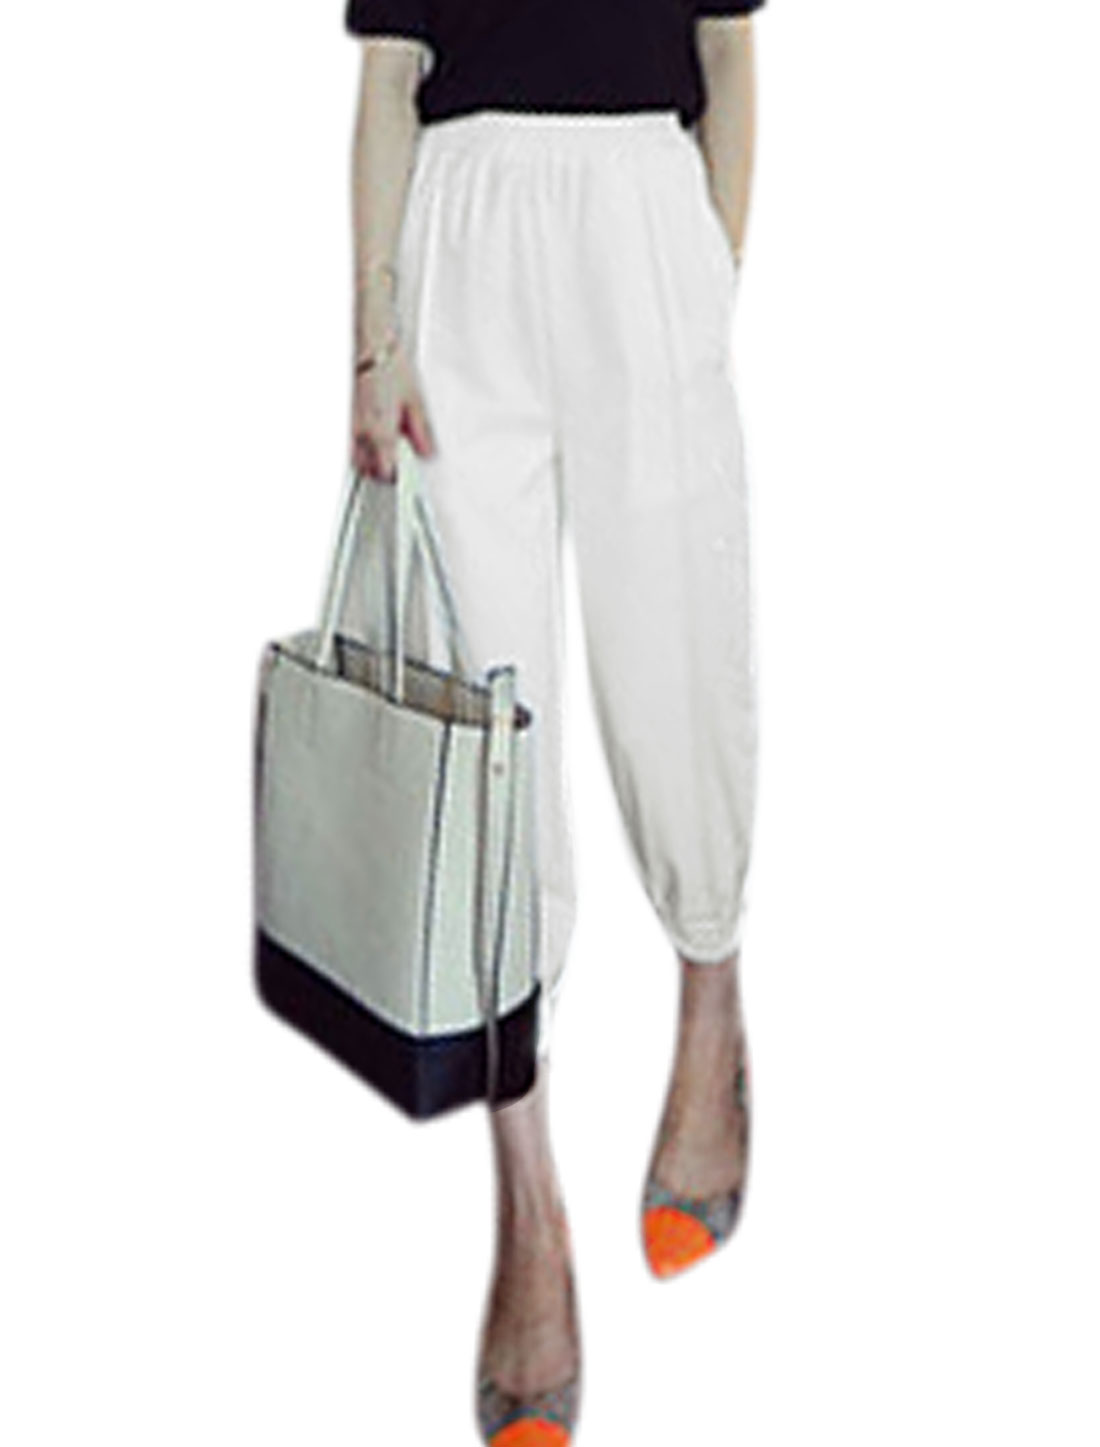 Woman Stretchy Waist Elastic Thigh Cuffs Slant Pockets Cropped Pants White XS